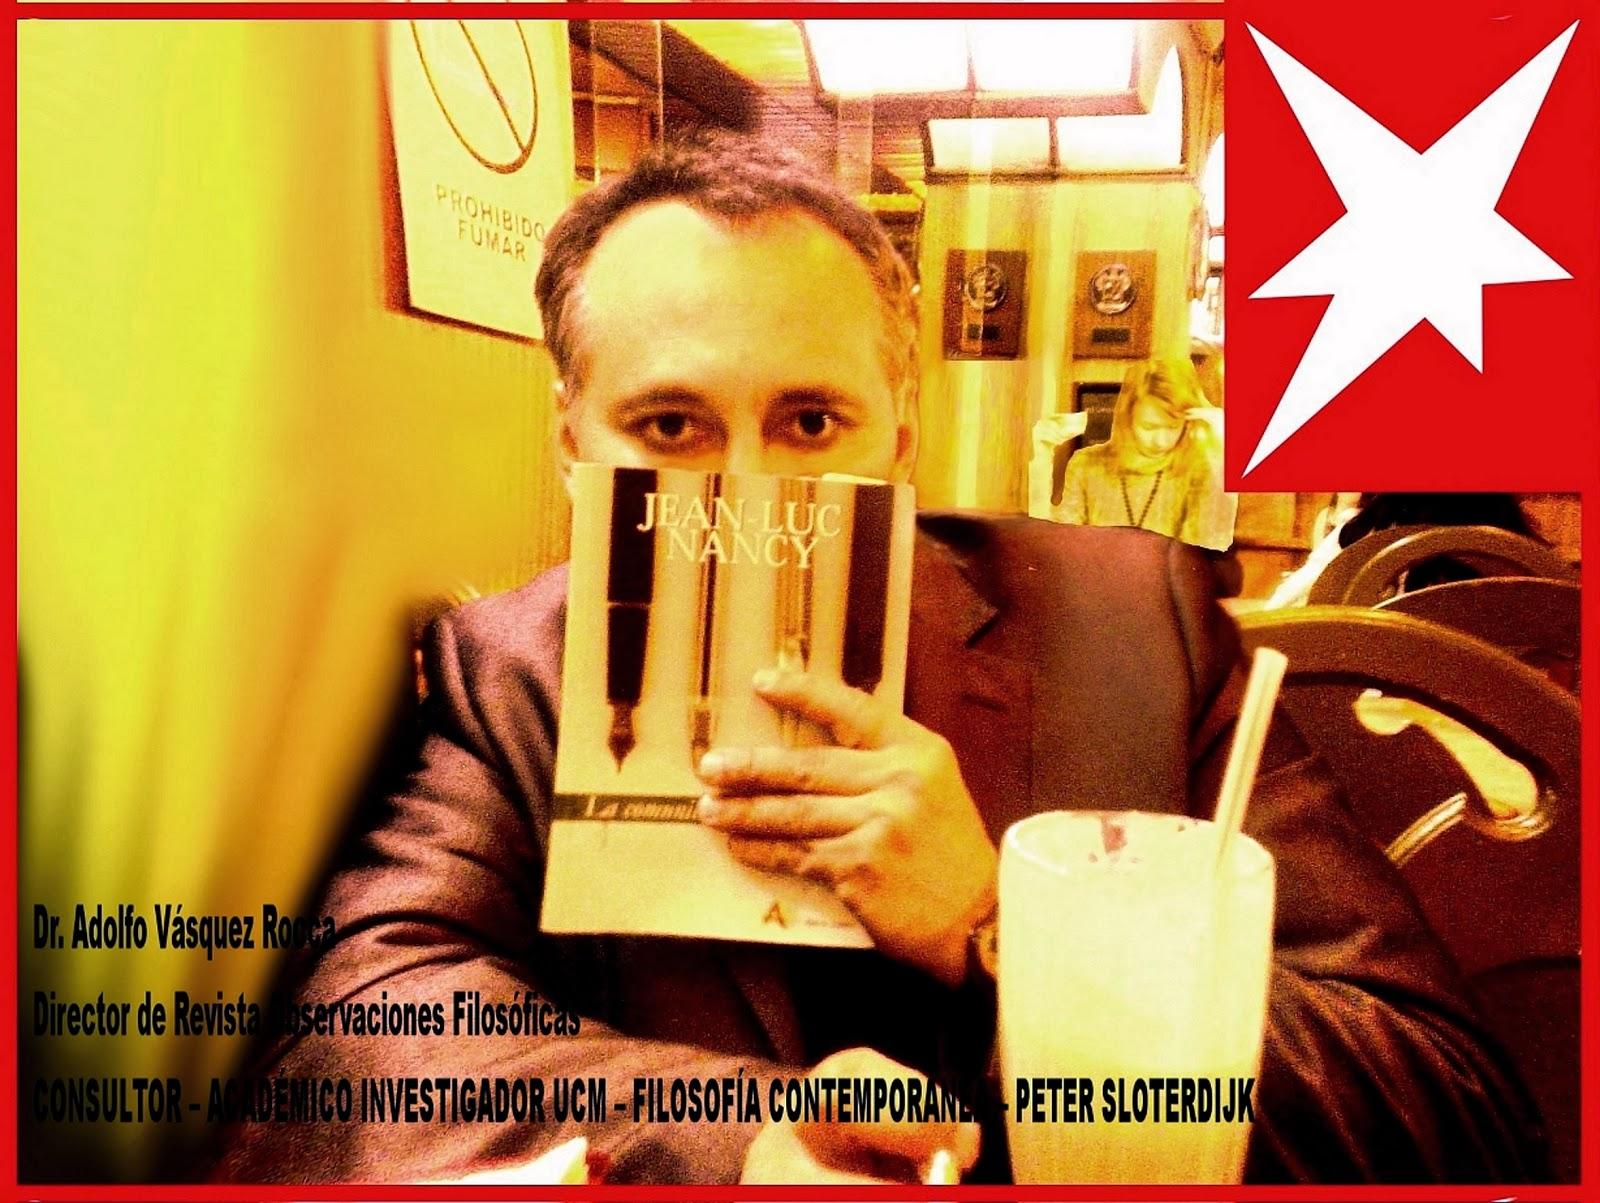 http://2.bp.blogspot.com/-tK-SlKjabcE/UuGzzcEU5LI/AAAAAAAANxU/8_7g_VZ-_JM/s1600/ADOLFO+VASQUEZ+ROCCA+PHD._+Doctor+en+Filosofia+_++Universidad+Complutense+de+Madrid+XL+.jpeg